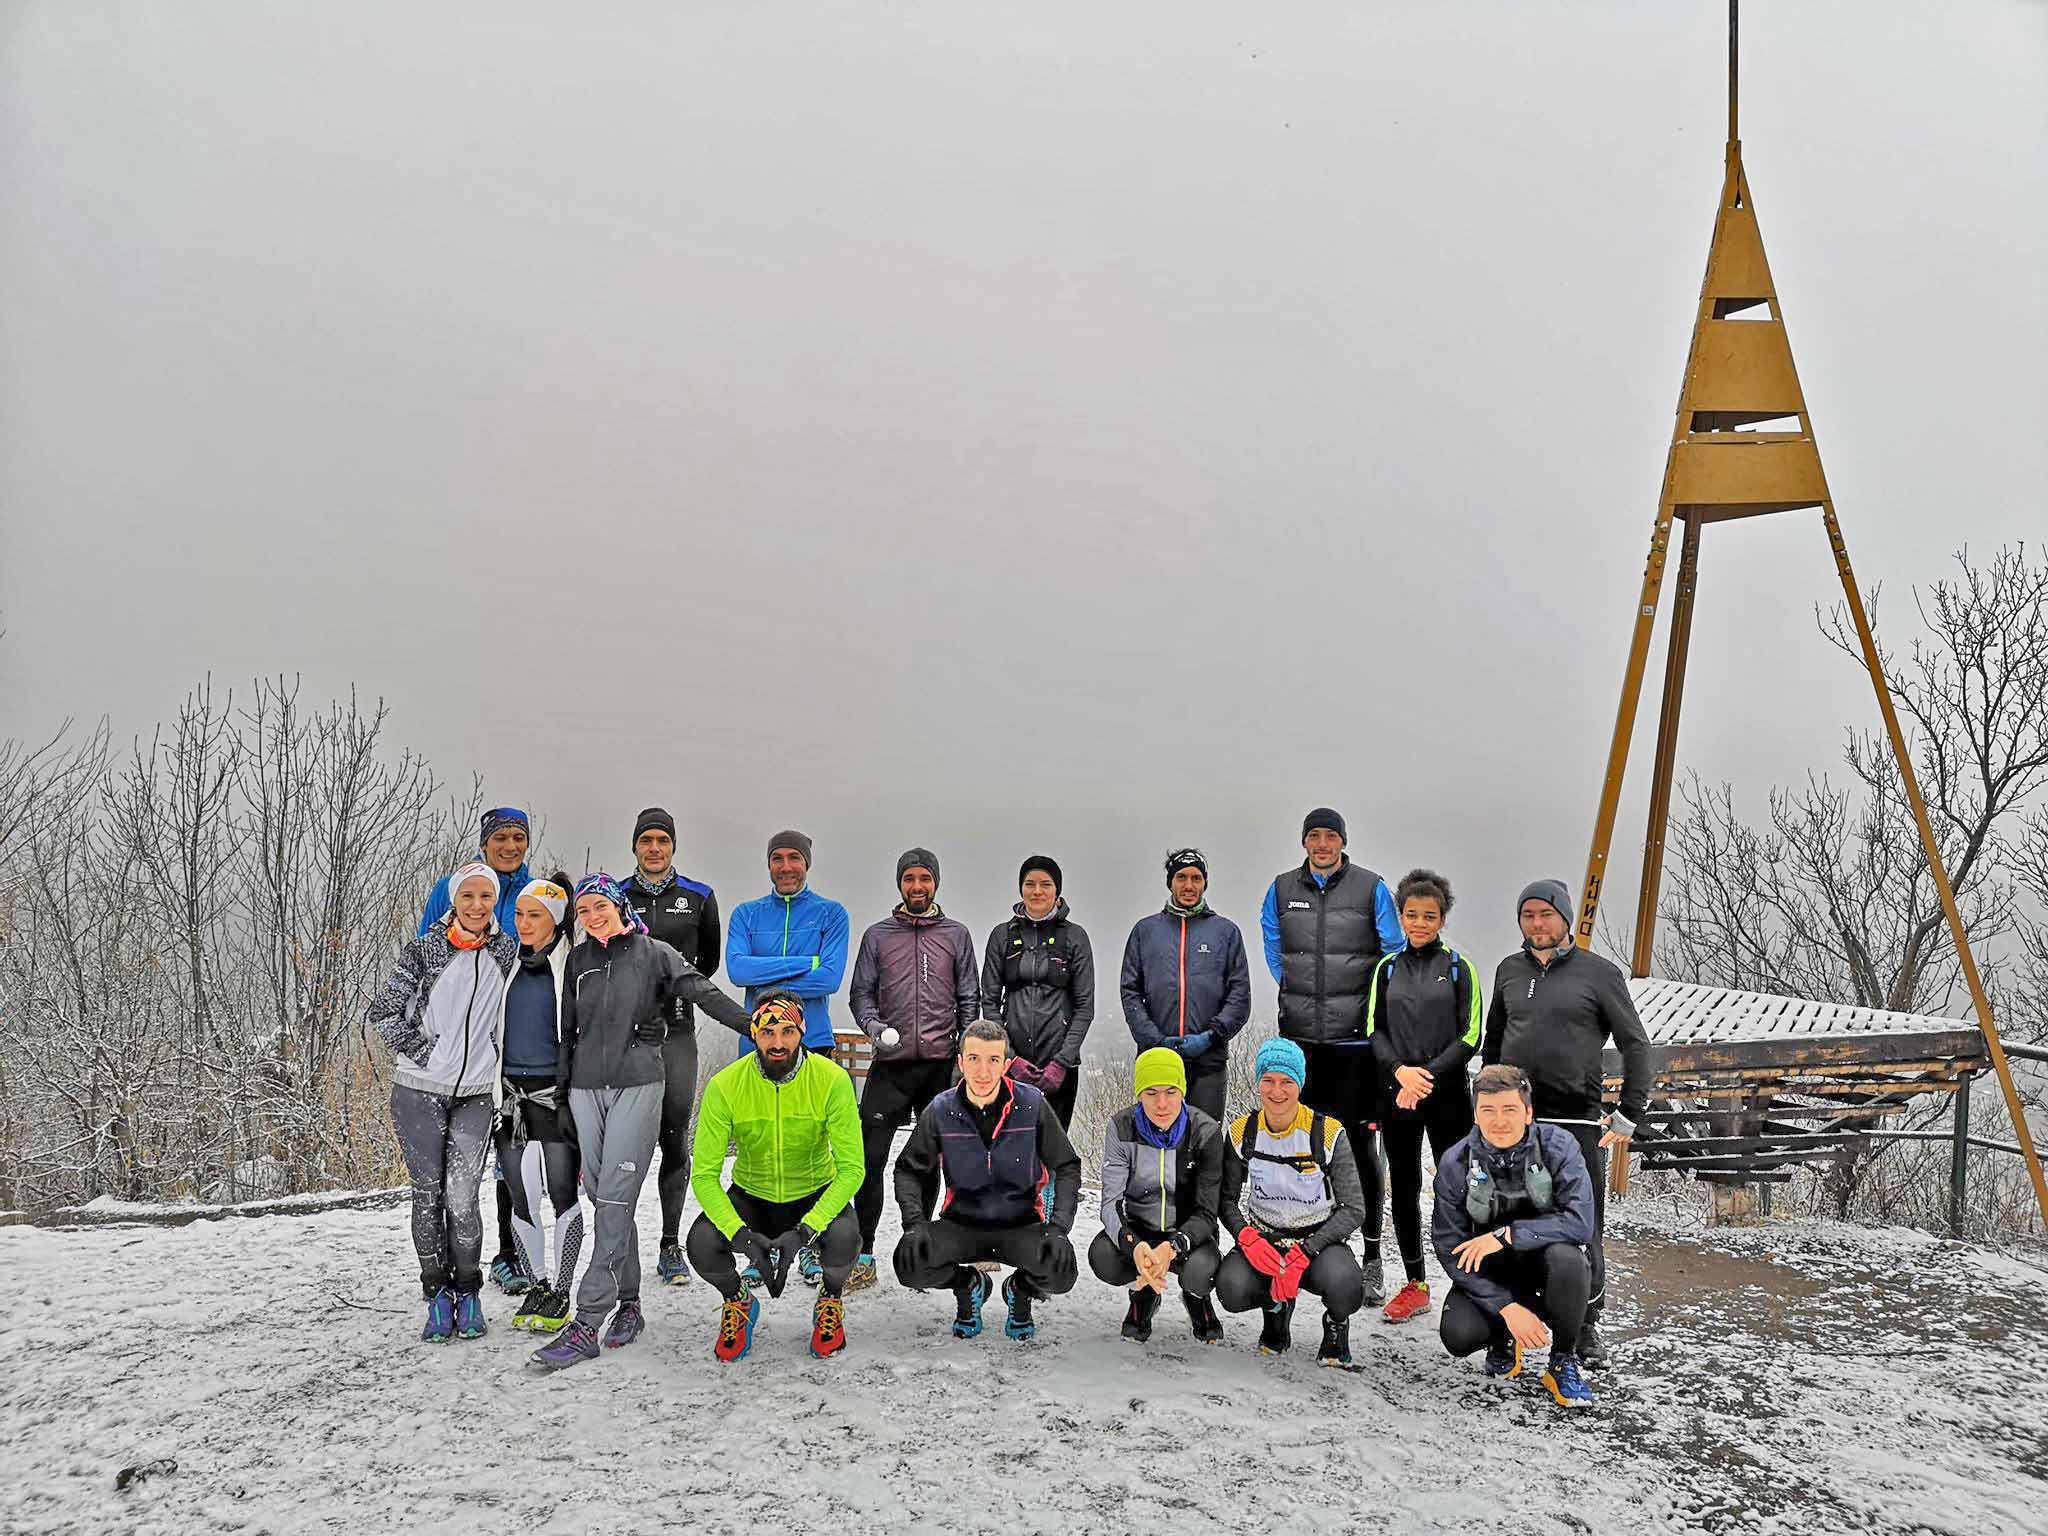 Alergare saptamanala 22 februarie 2020 redimensionată